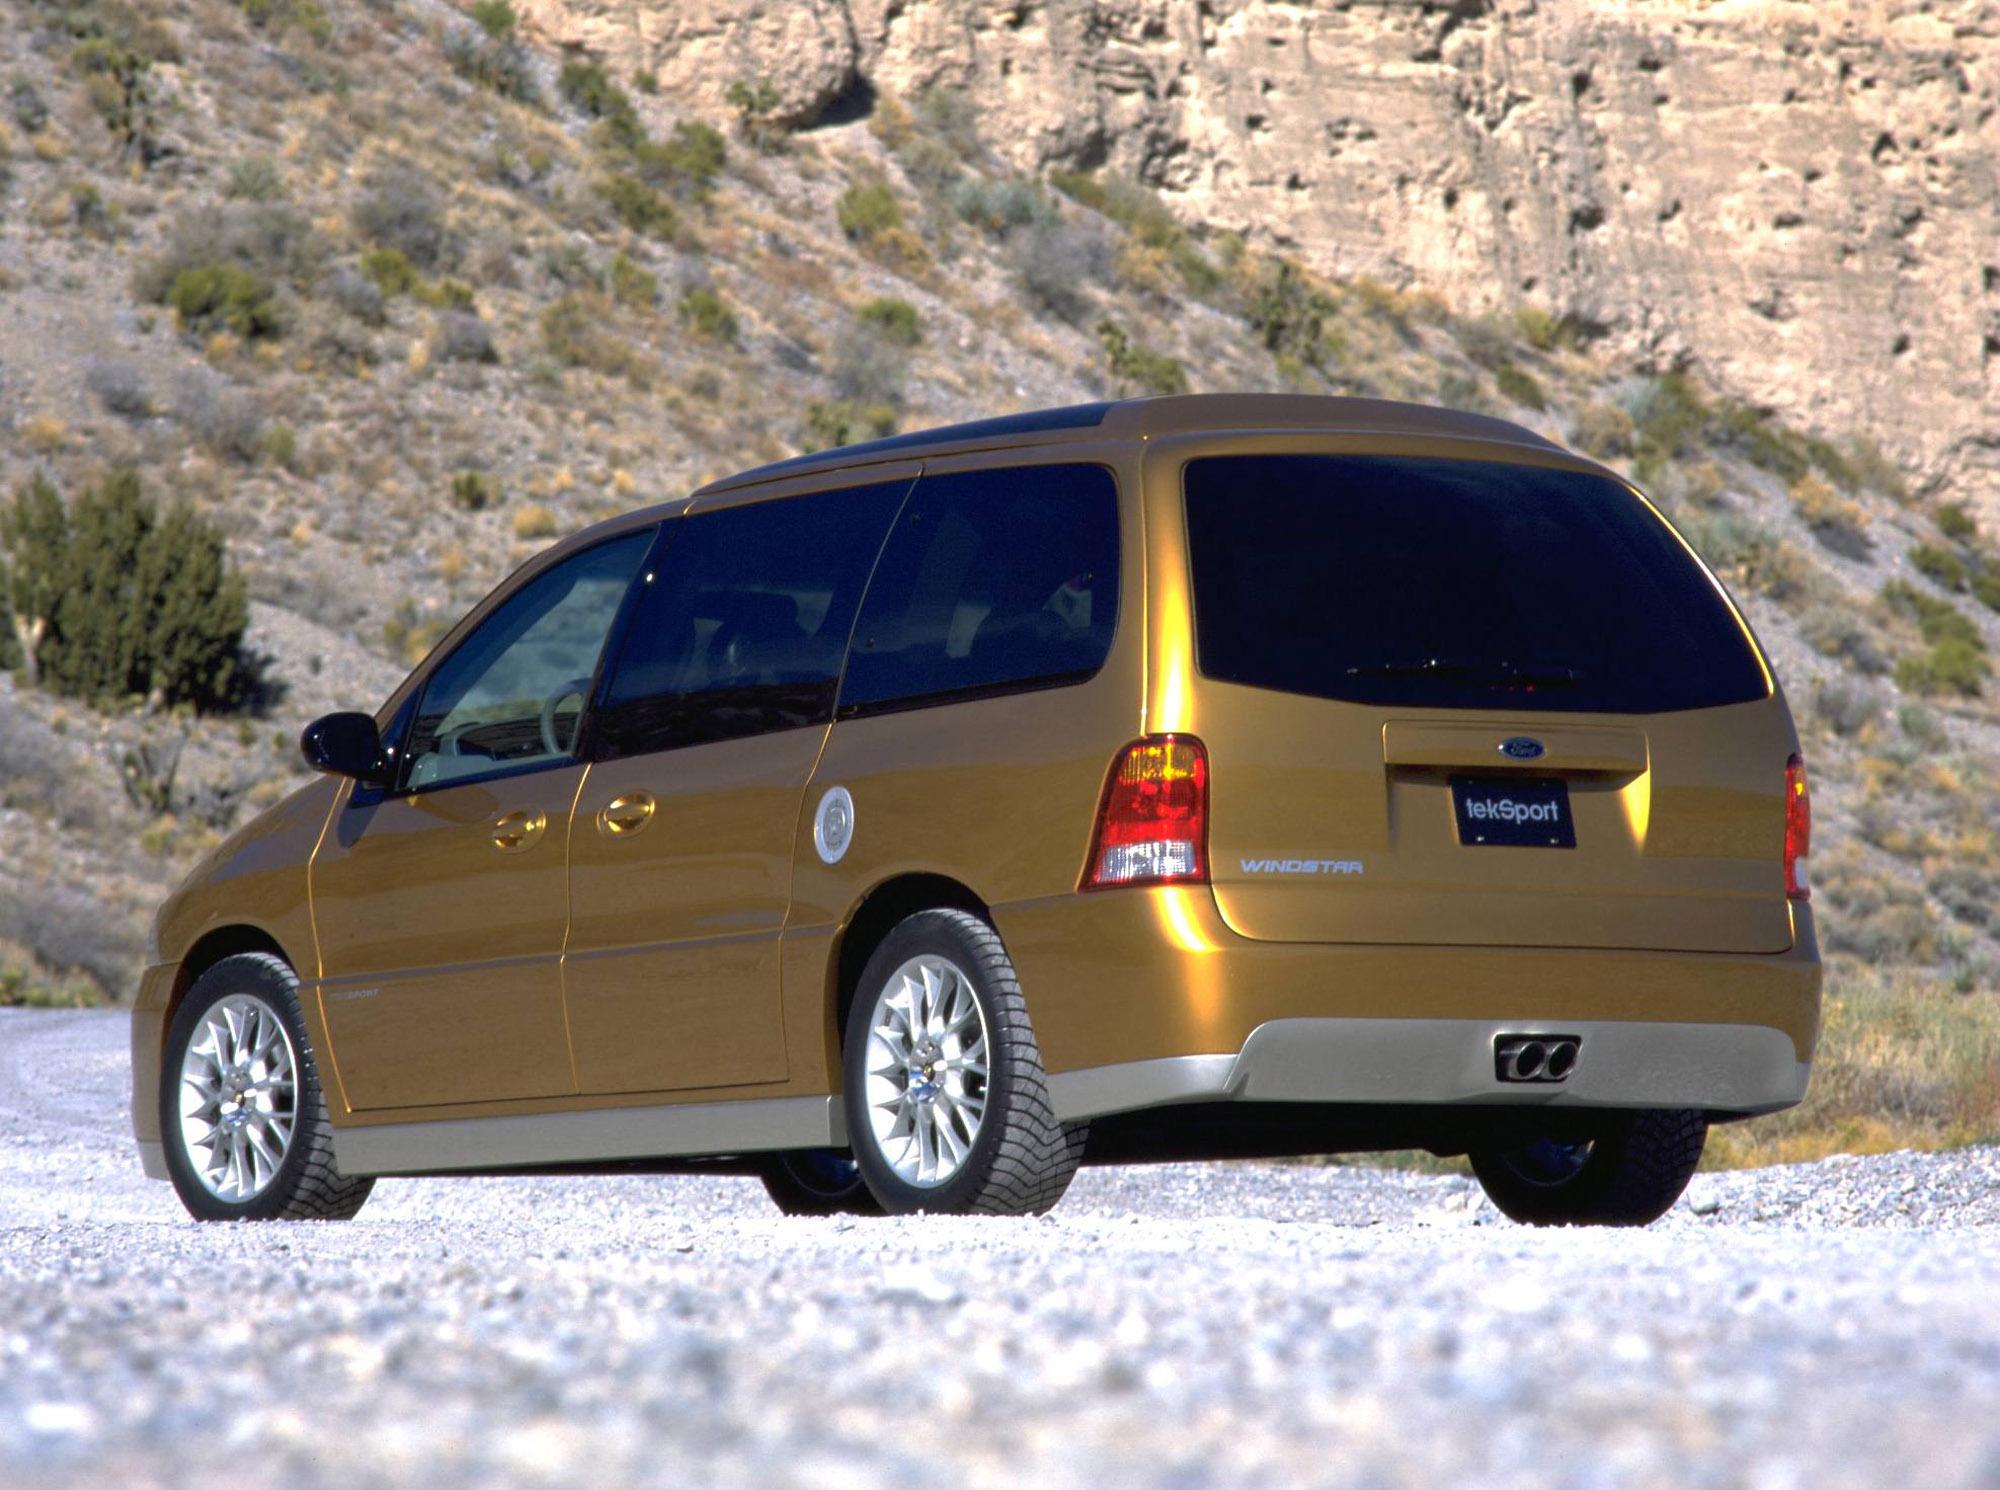 Citroen ds3 picture 24576 cadillac bls wagon ford windstar teksport publicscrutiny Gallery